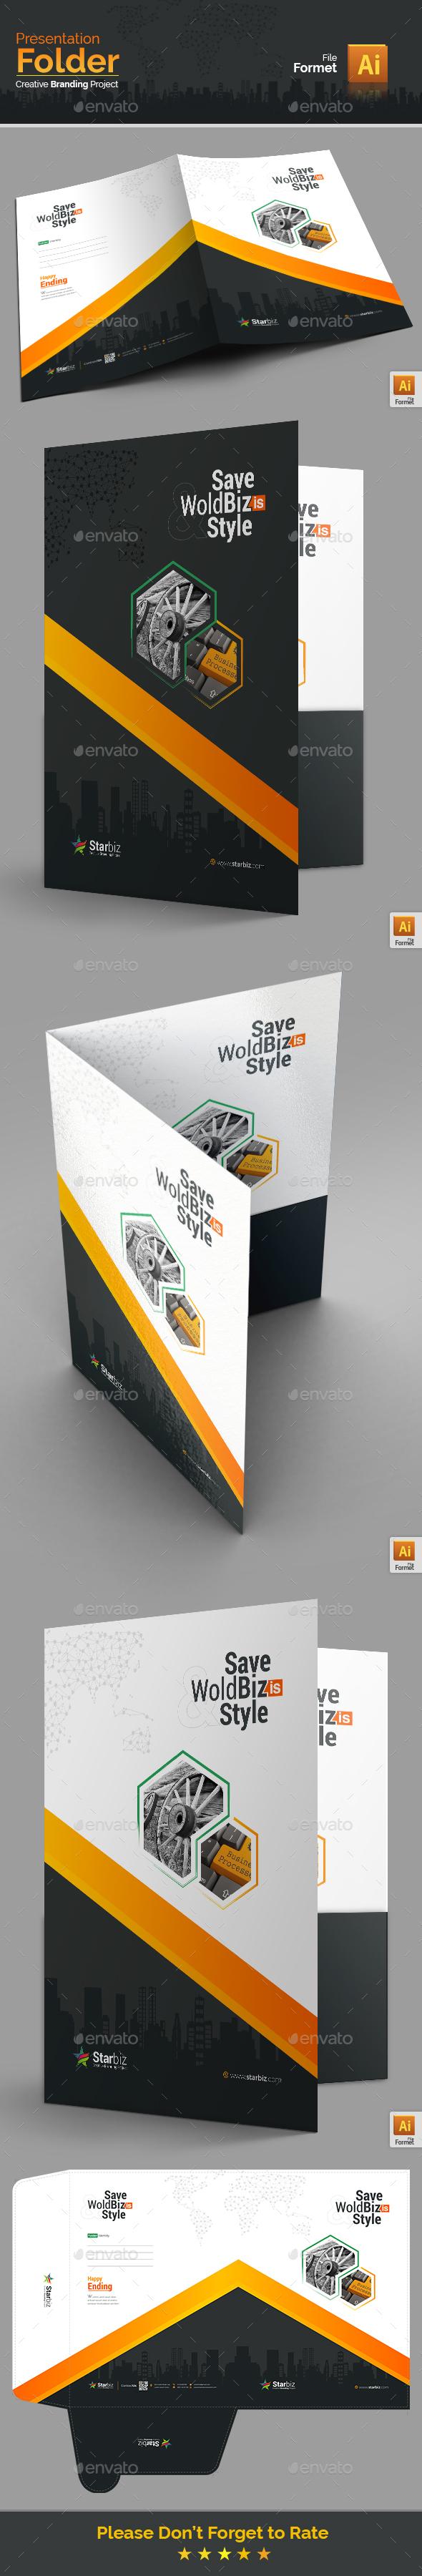 GraphicRiver Presentation Folder 20649899